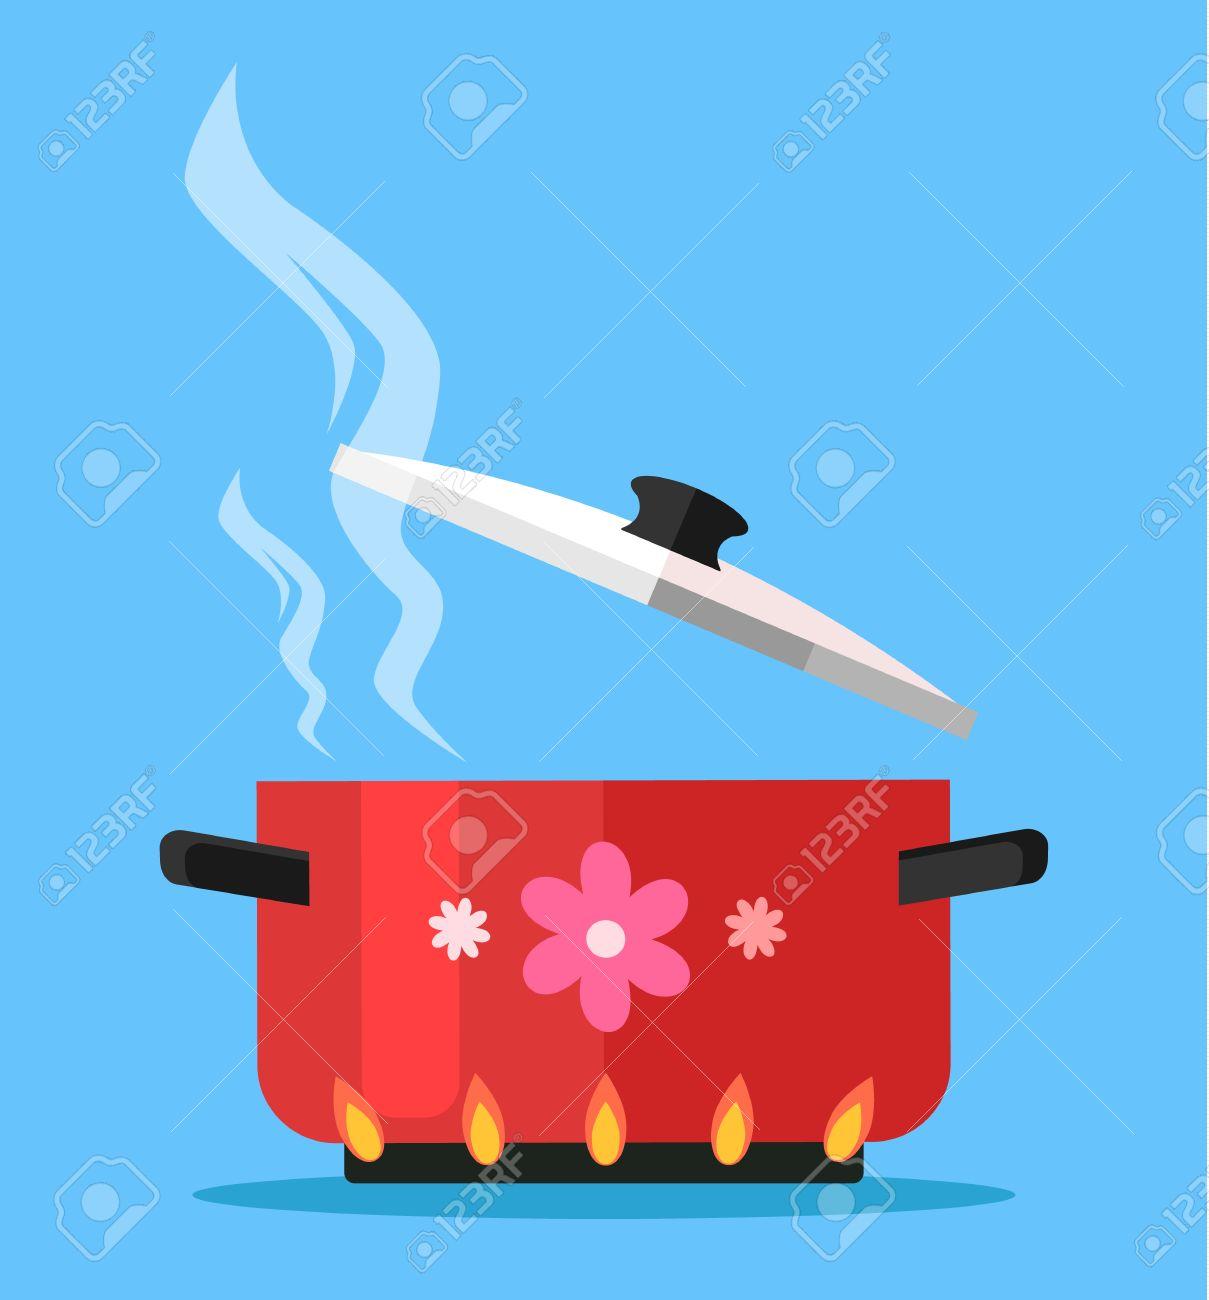 Boiling water in pan. Vector flat cartoon illustration - 59706837